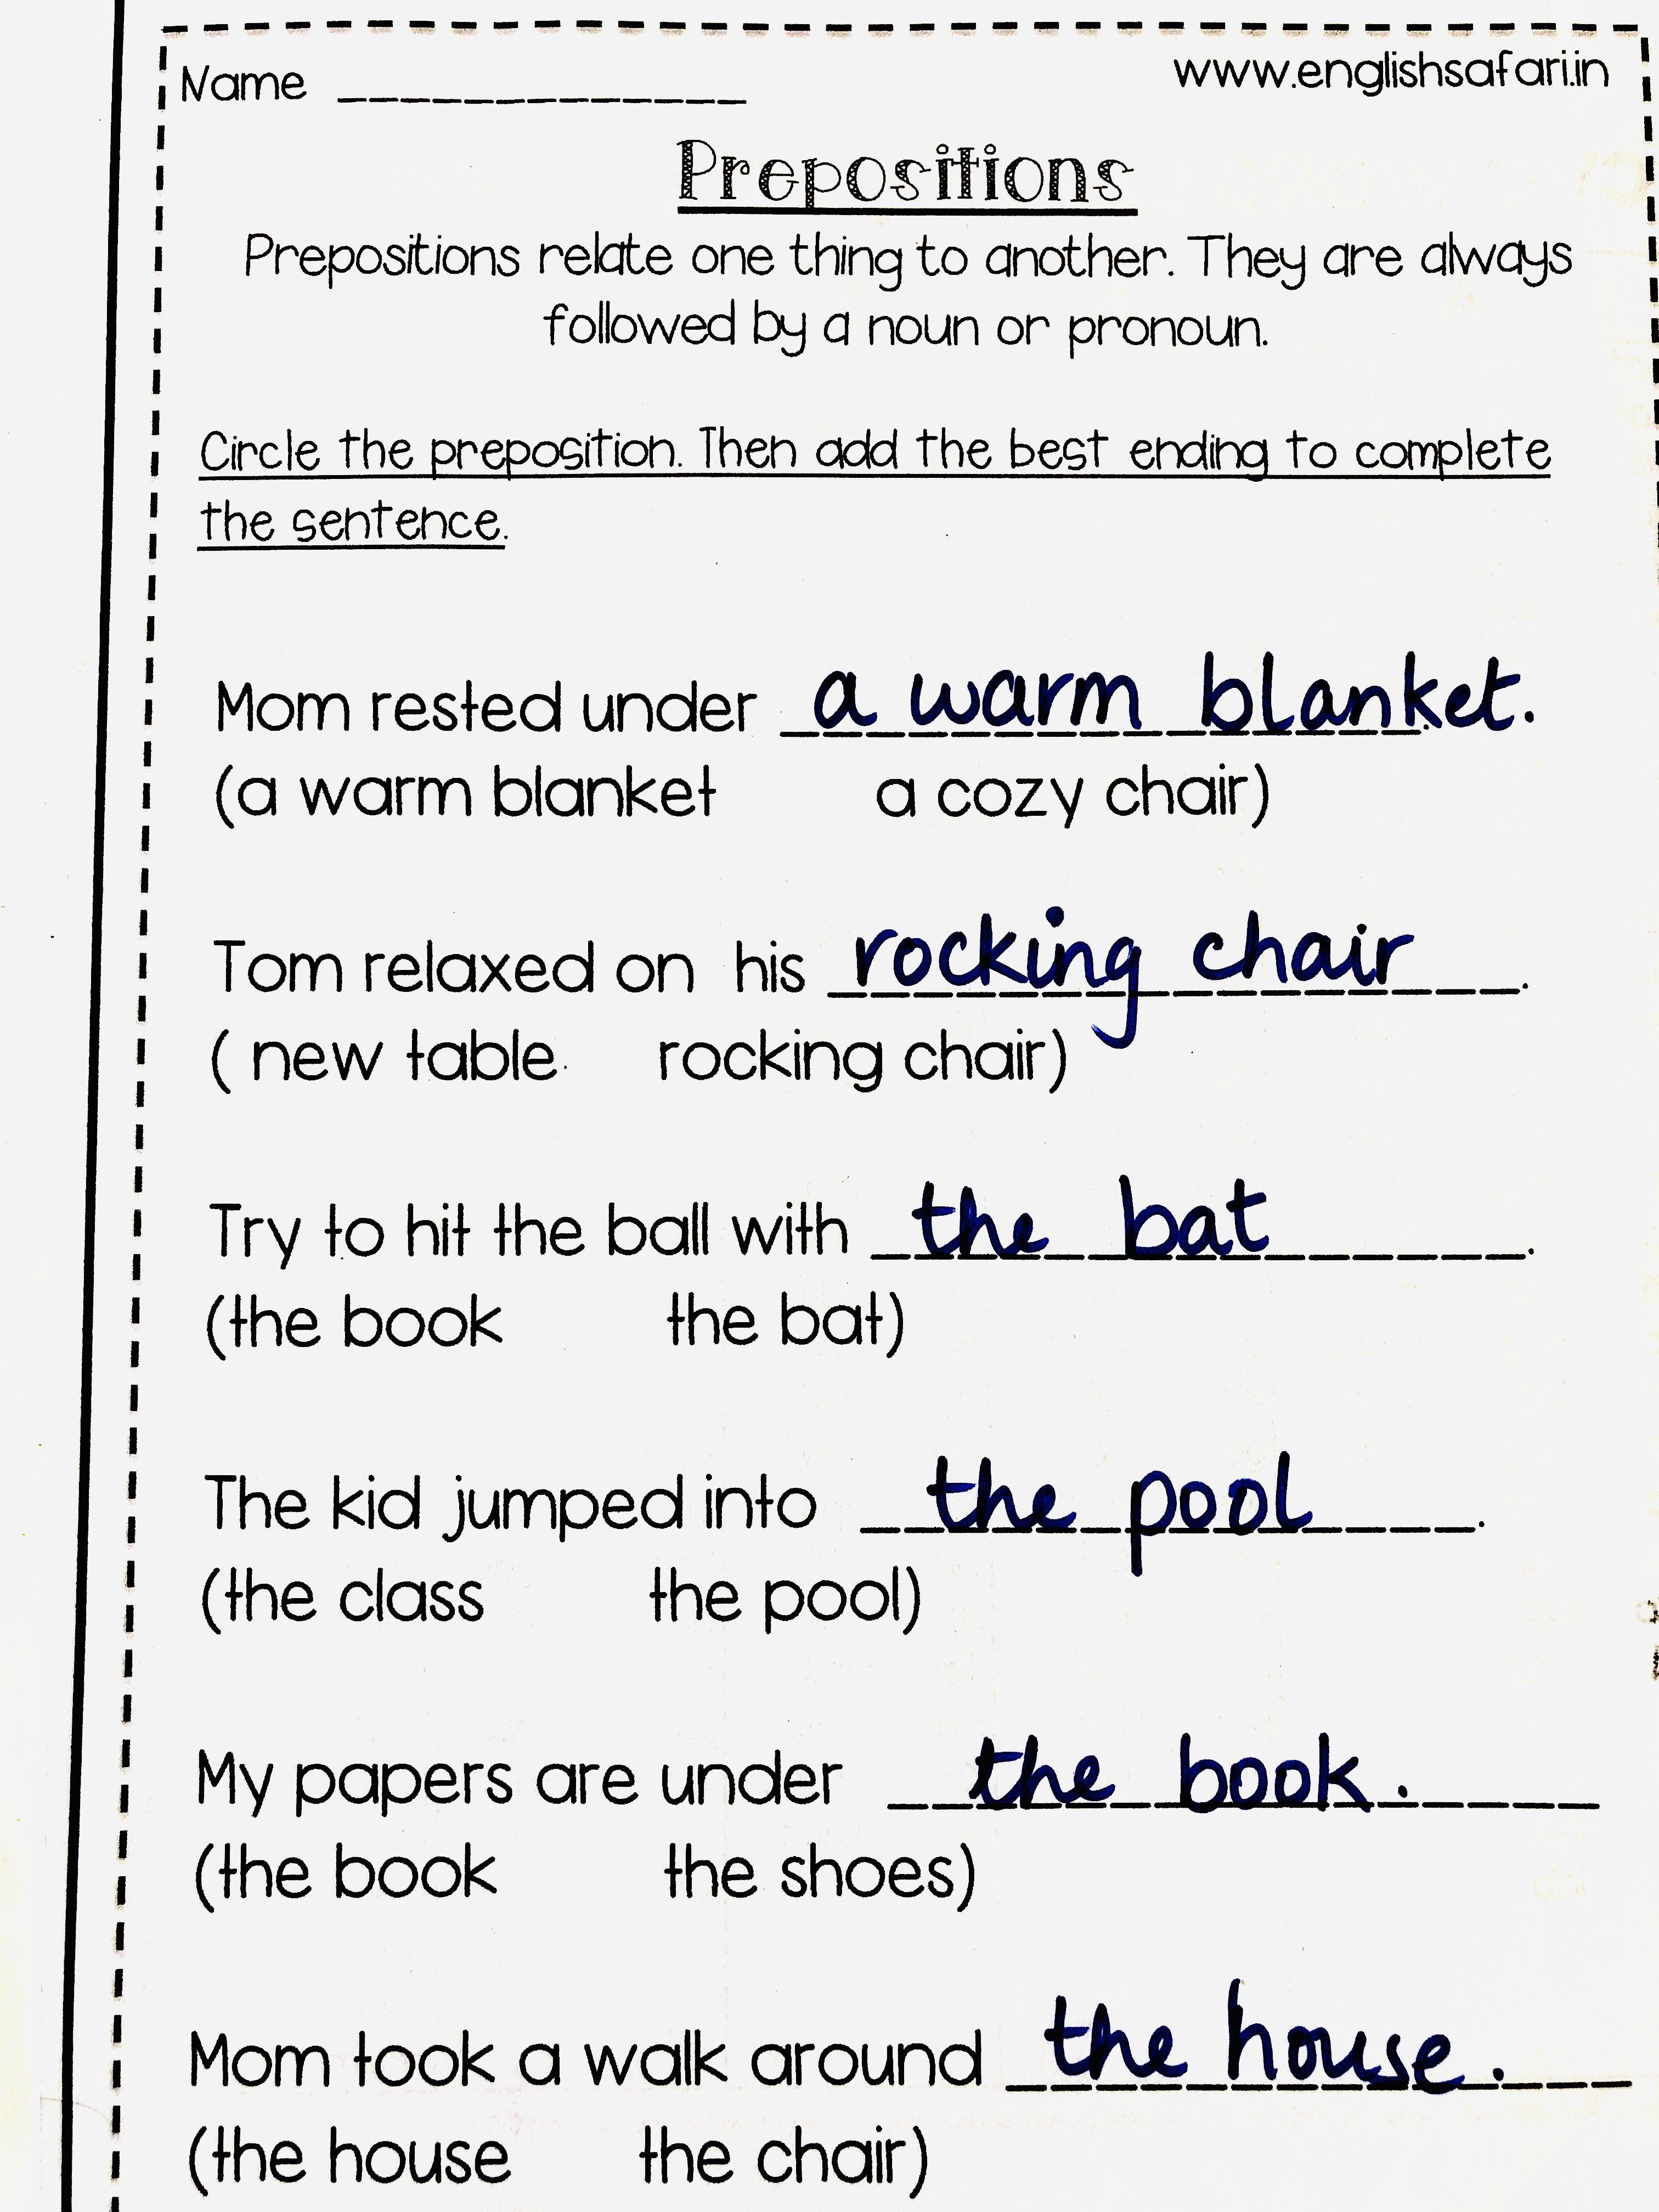 Free Prepositions Worksheet Englishsafari In